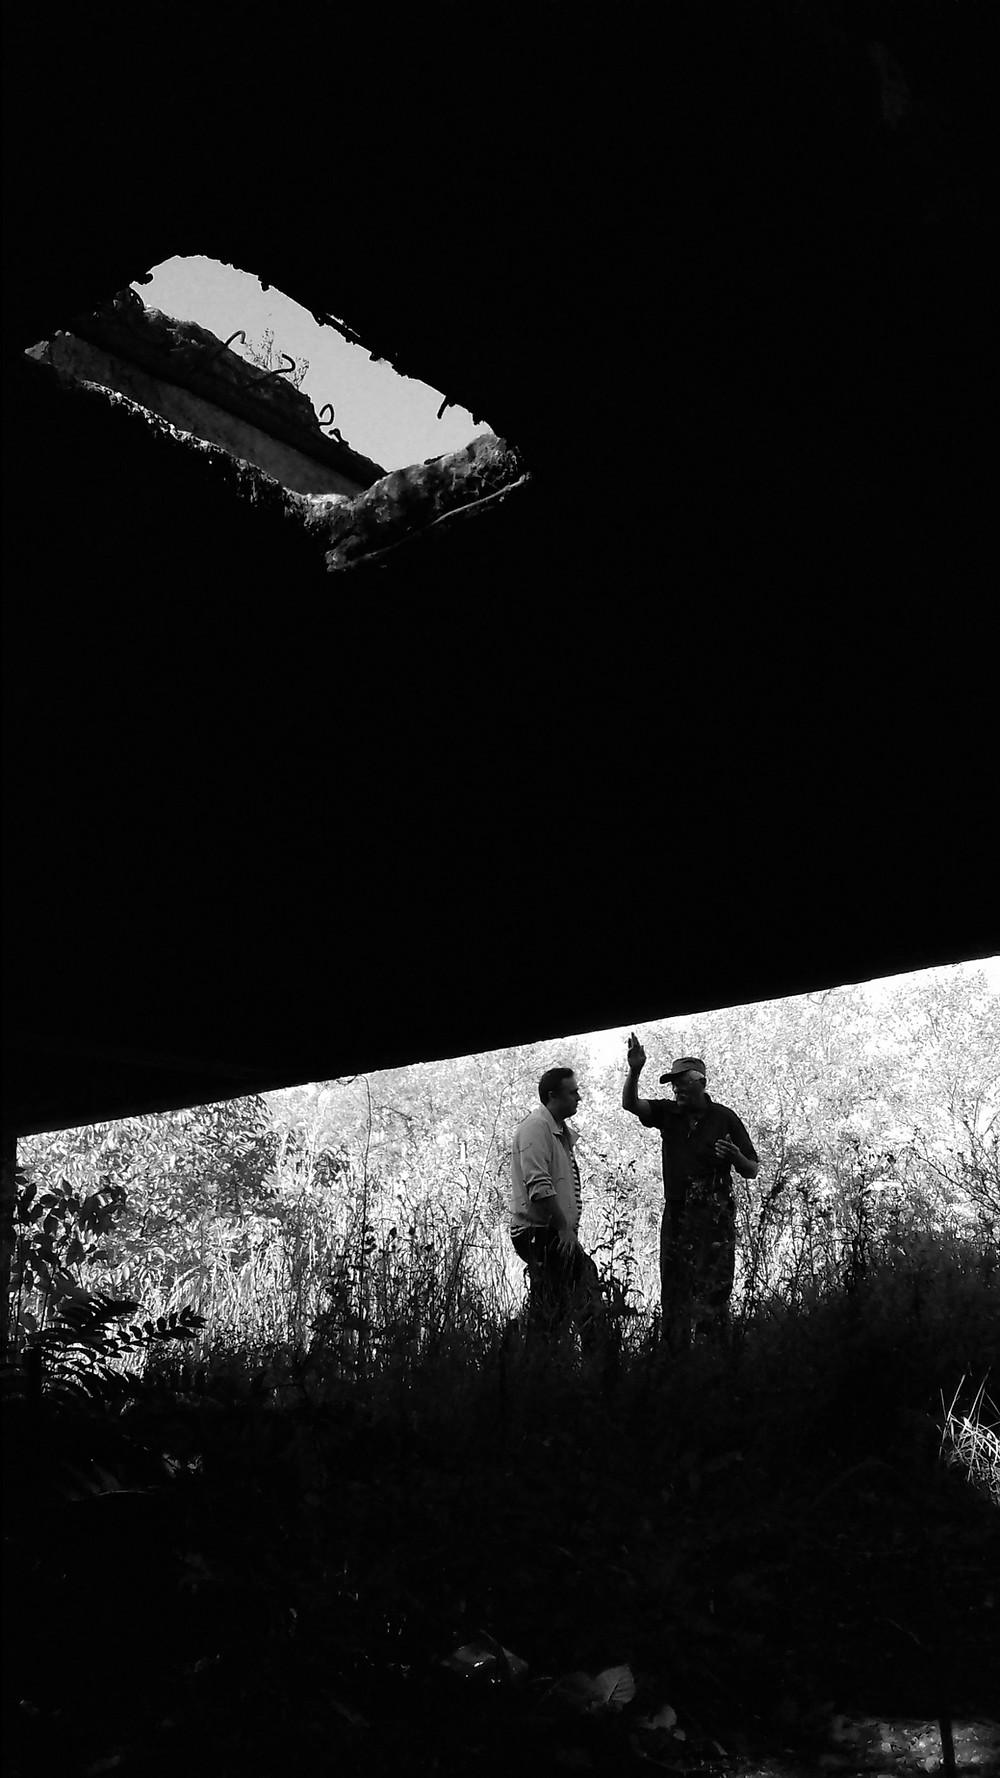 Fotografie: Theophil Soltesz; Francisc Jung sau nea Öcsi